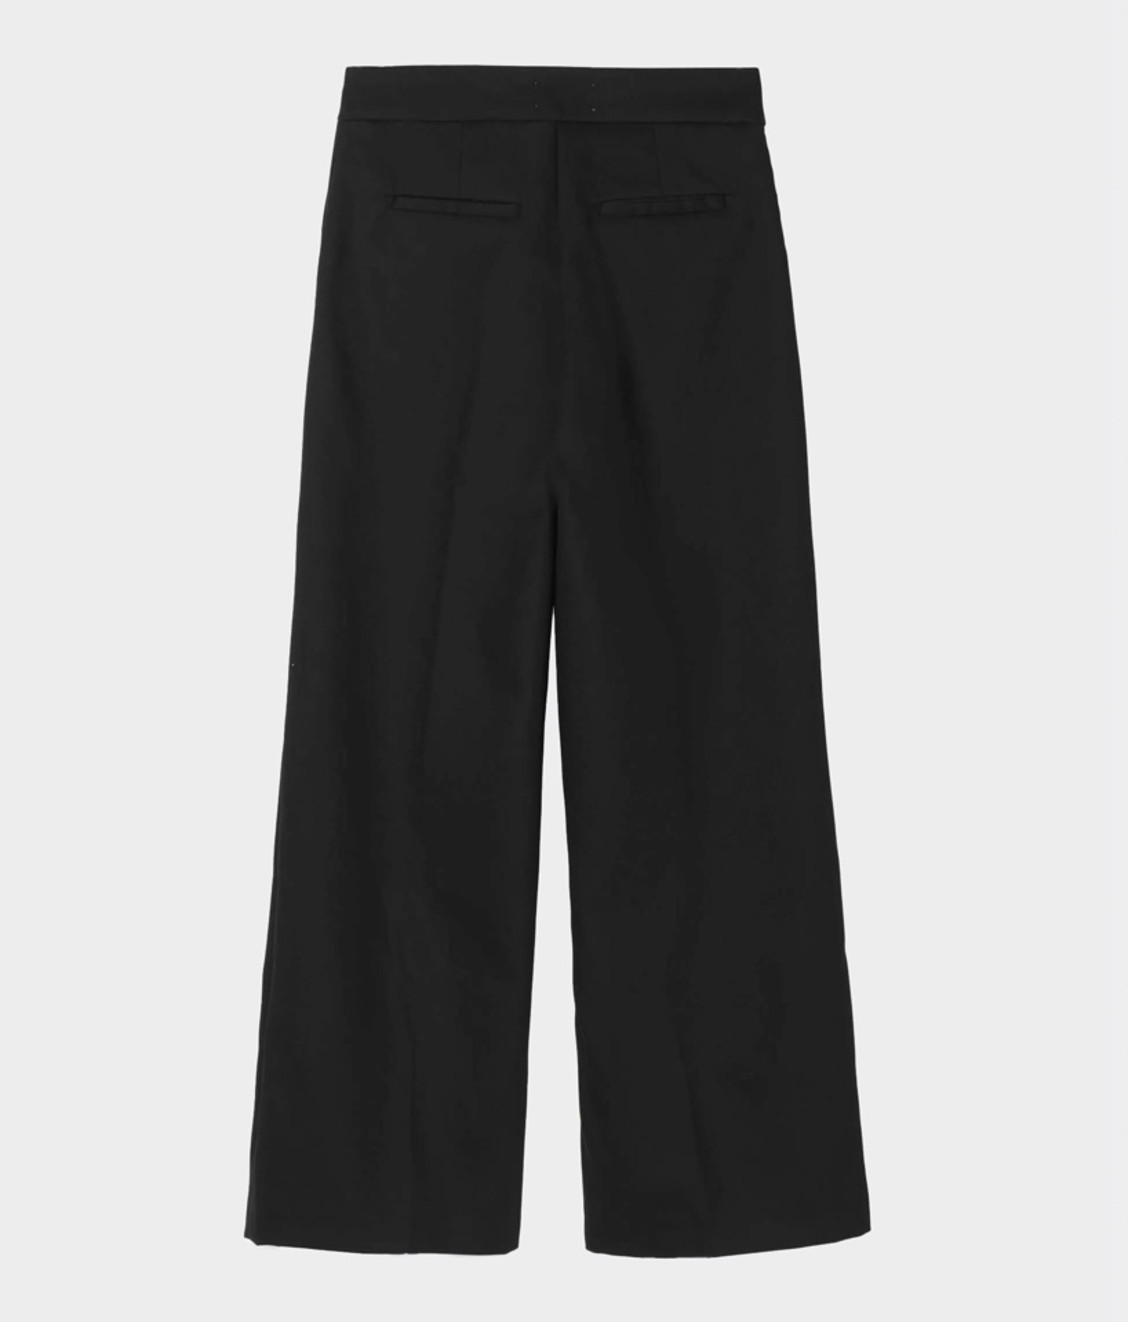 Libertine Libertine Libertine Lark Trousers Black